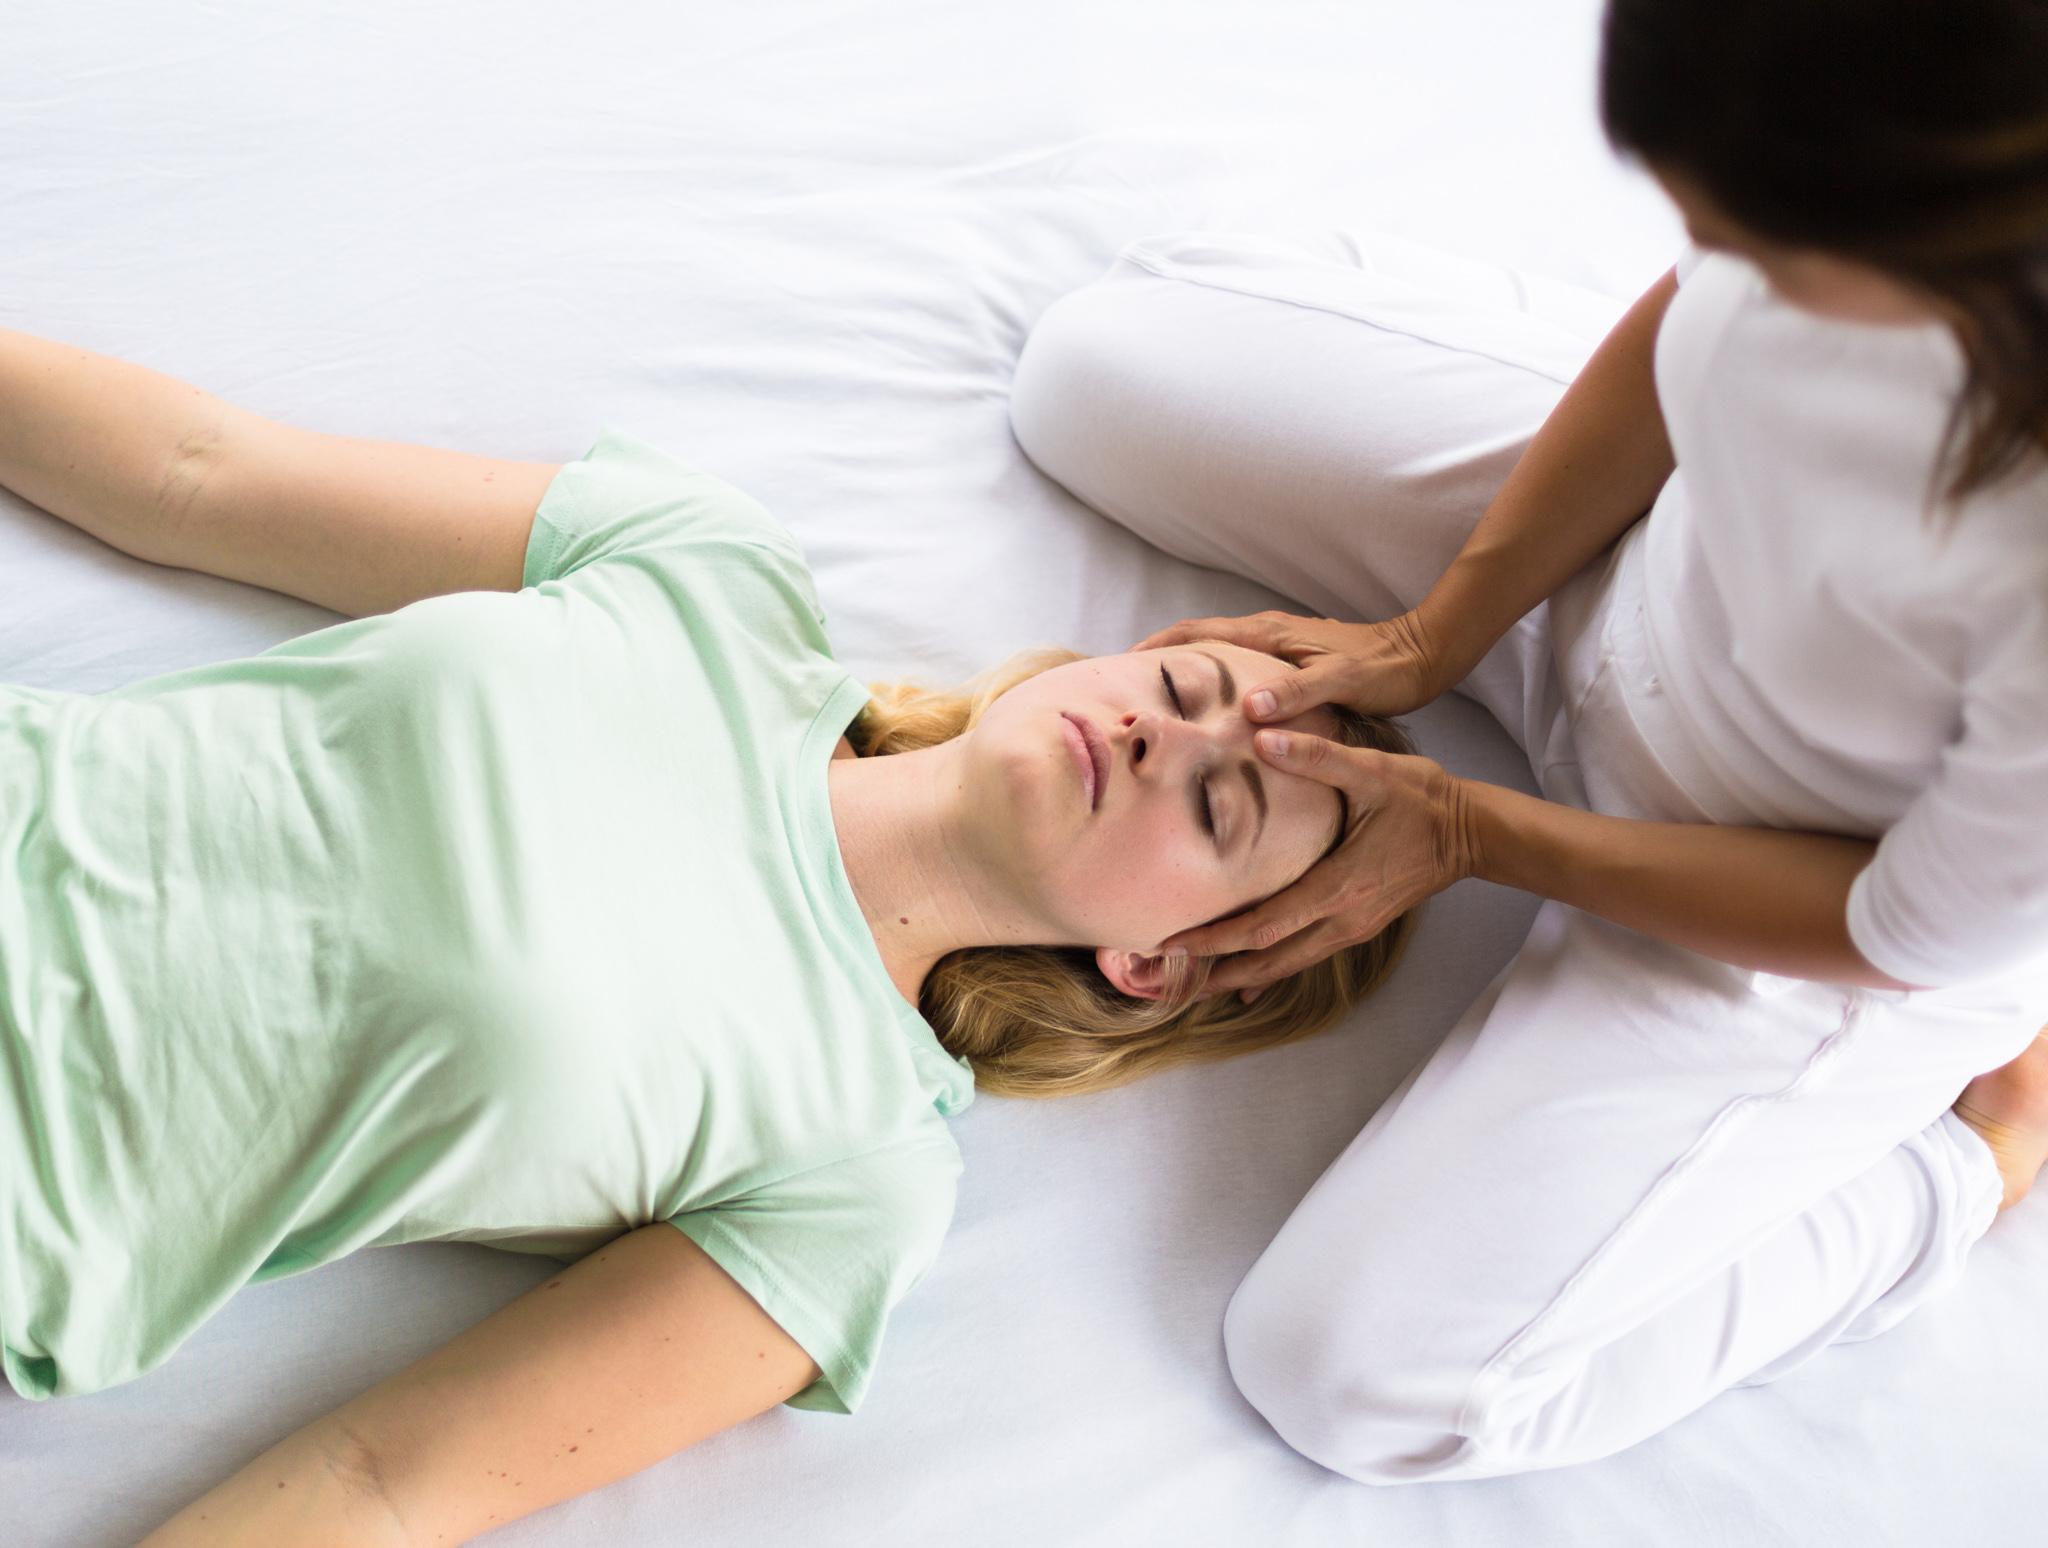 Shiatsu_Massage_Carola_Bass_(c)_Paul_Henschel-7165.jpg